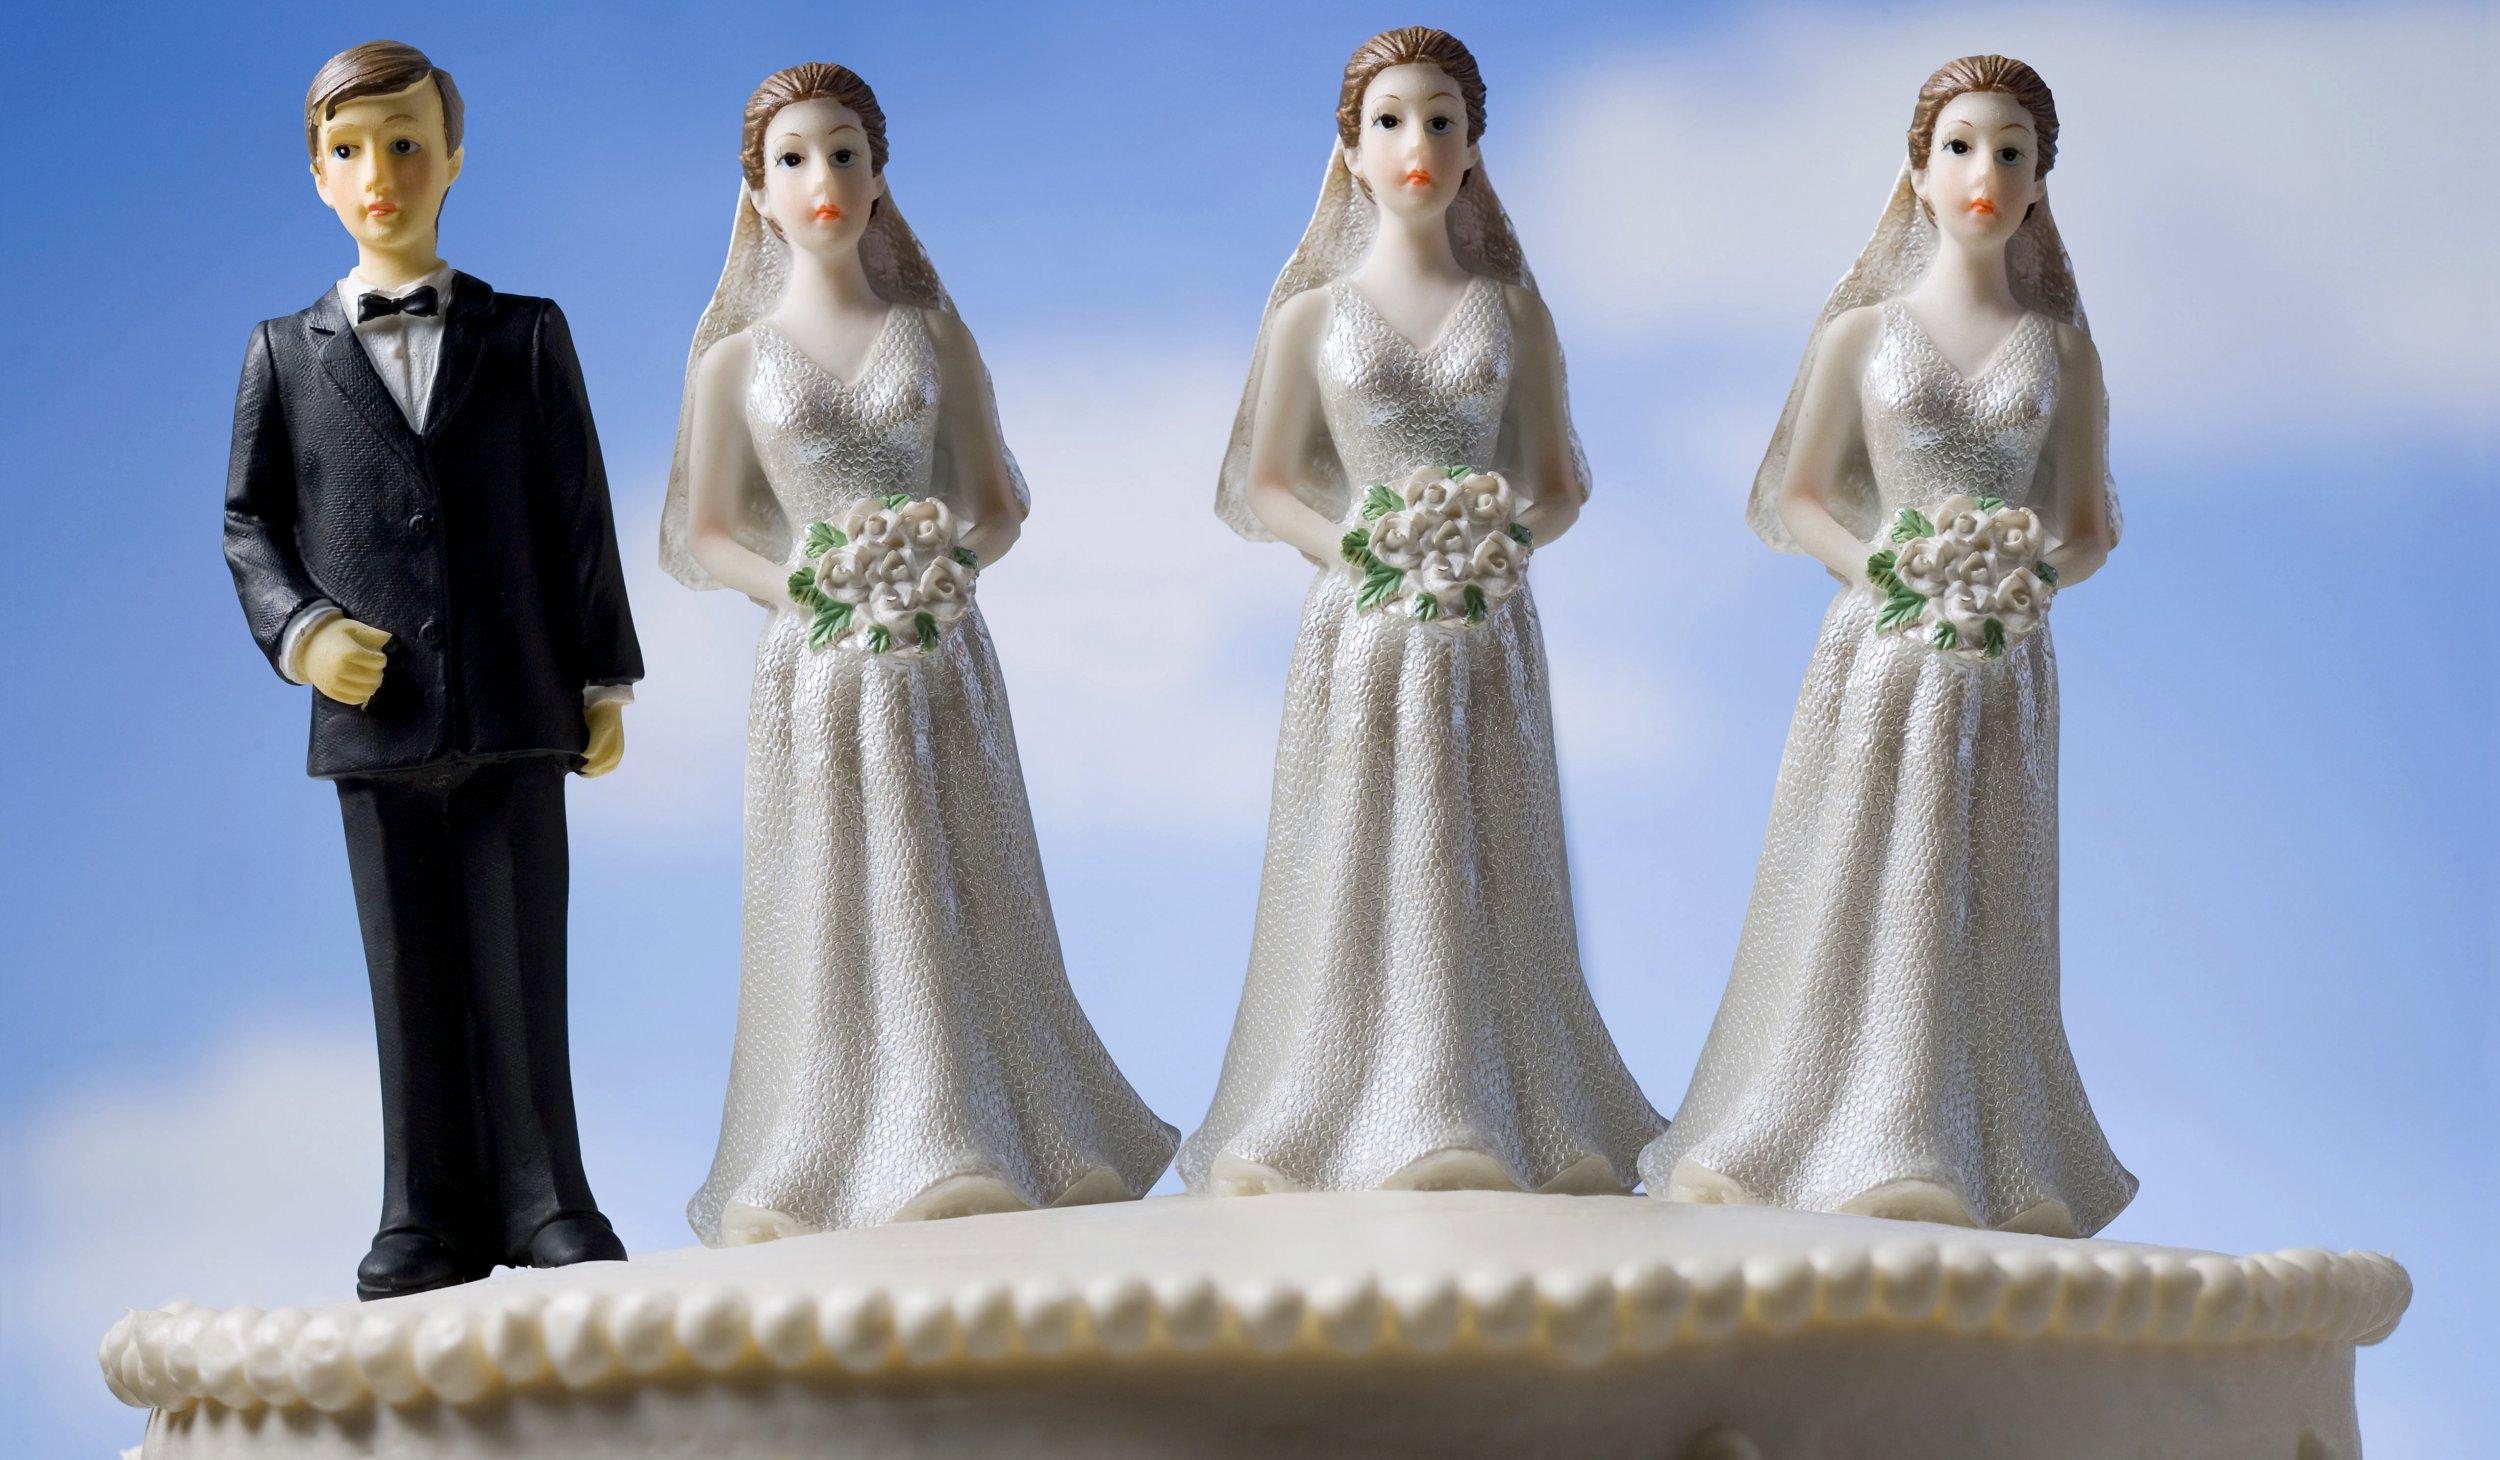 07_02_polygamist_01